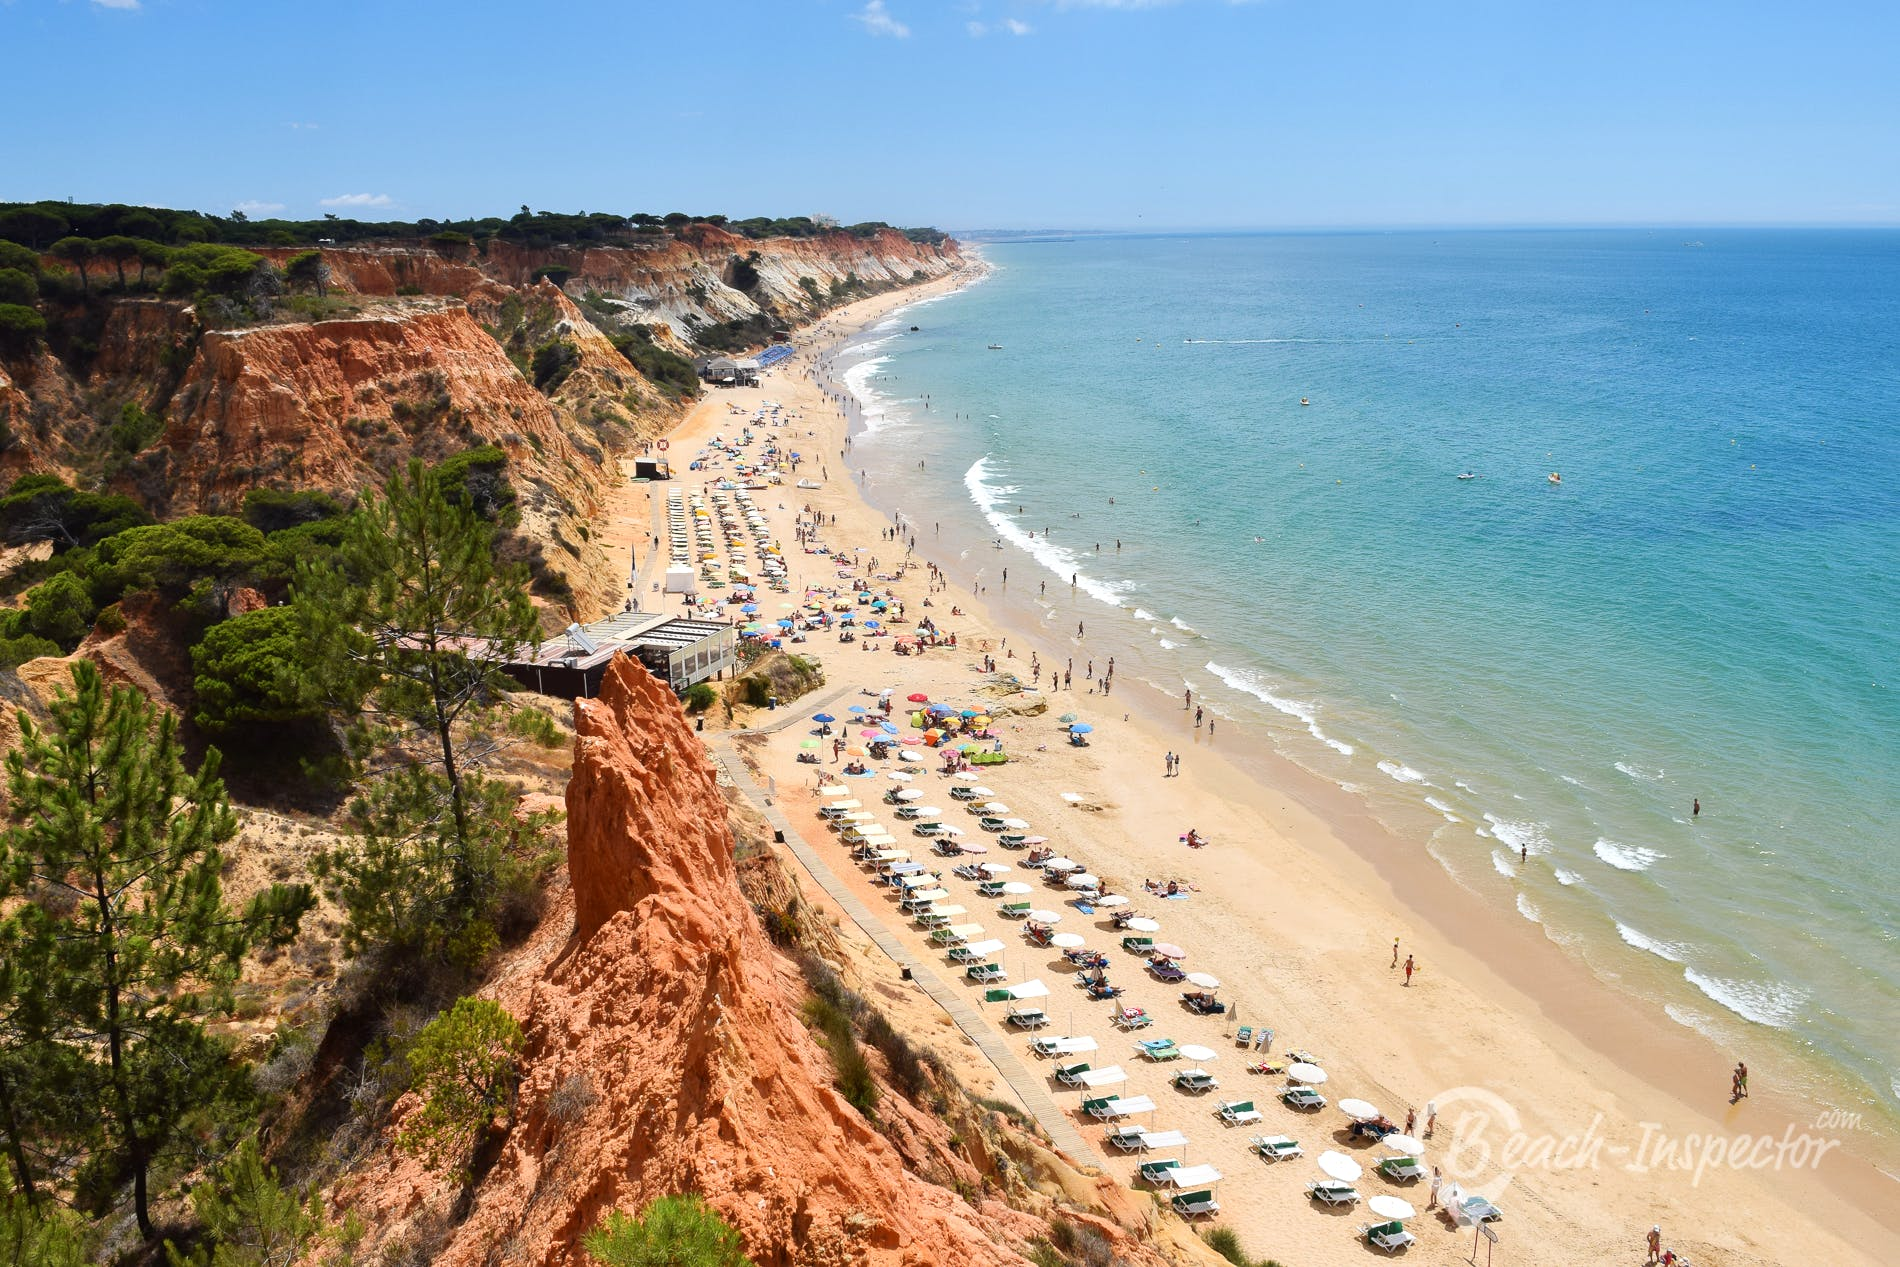 Beach Praia Barranco das Belharucas, Algarve, Portugal